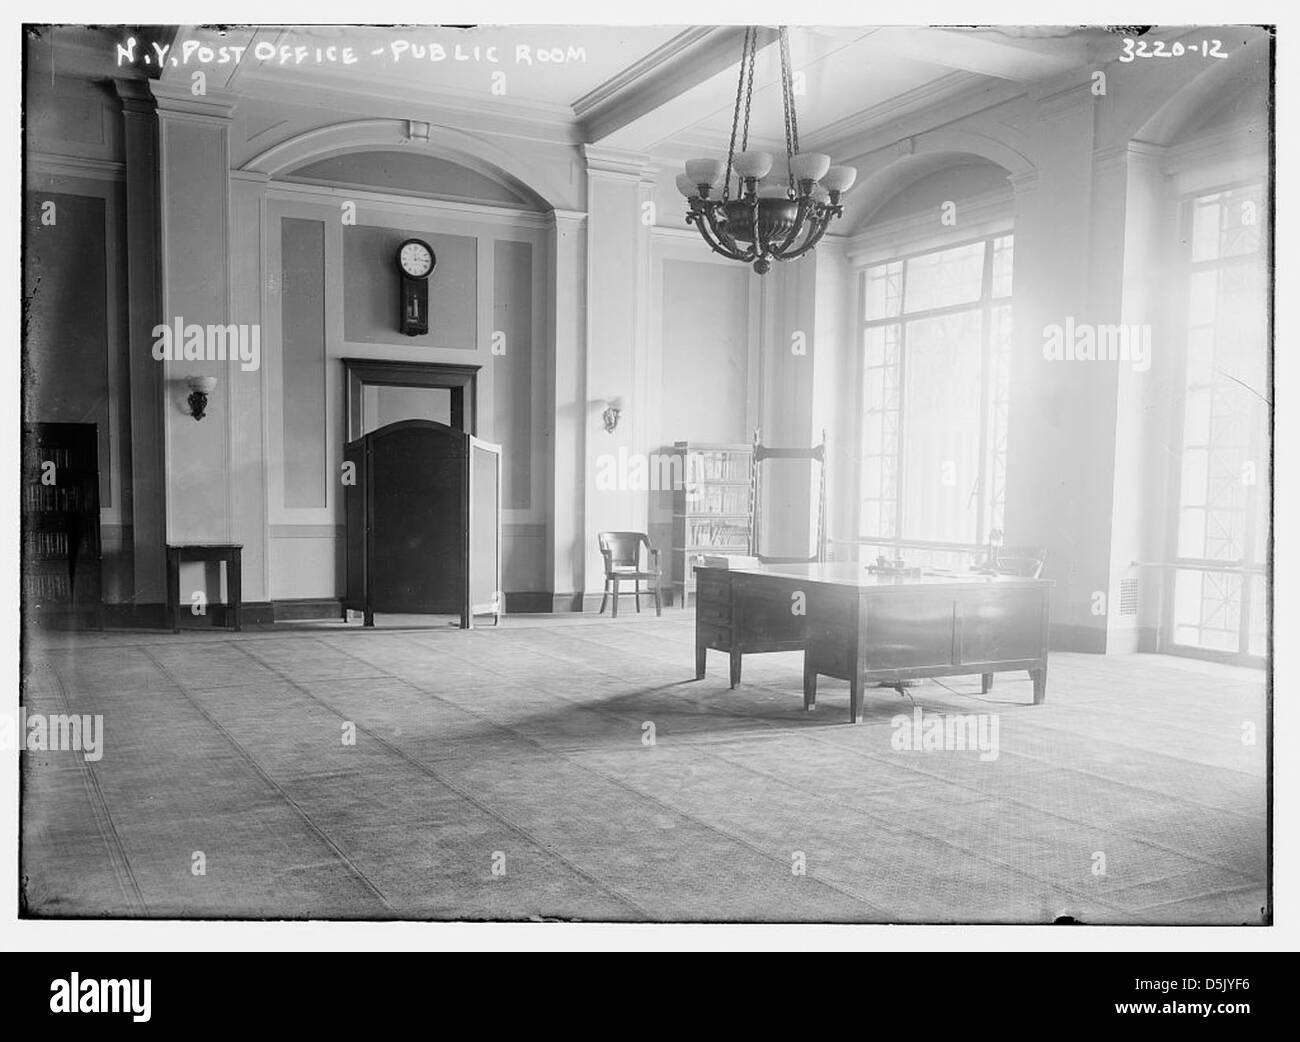 N.Y. Post Office -- Public Room (LOC) - Stock Image